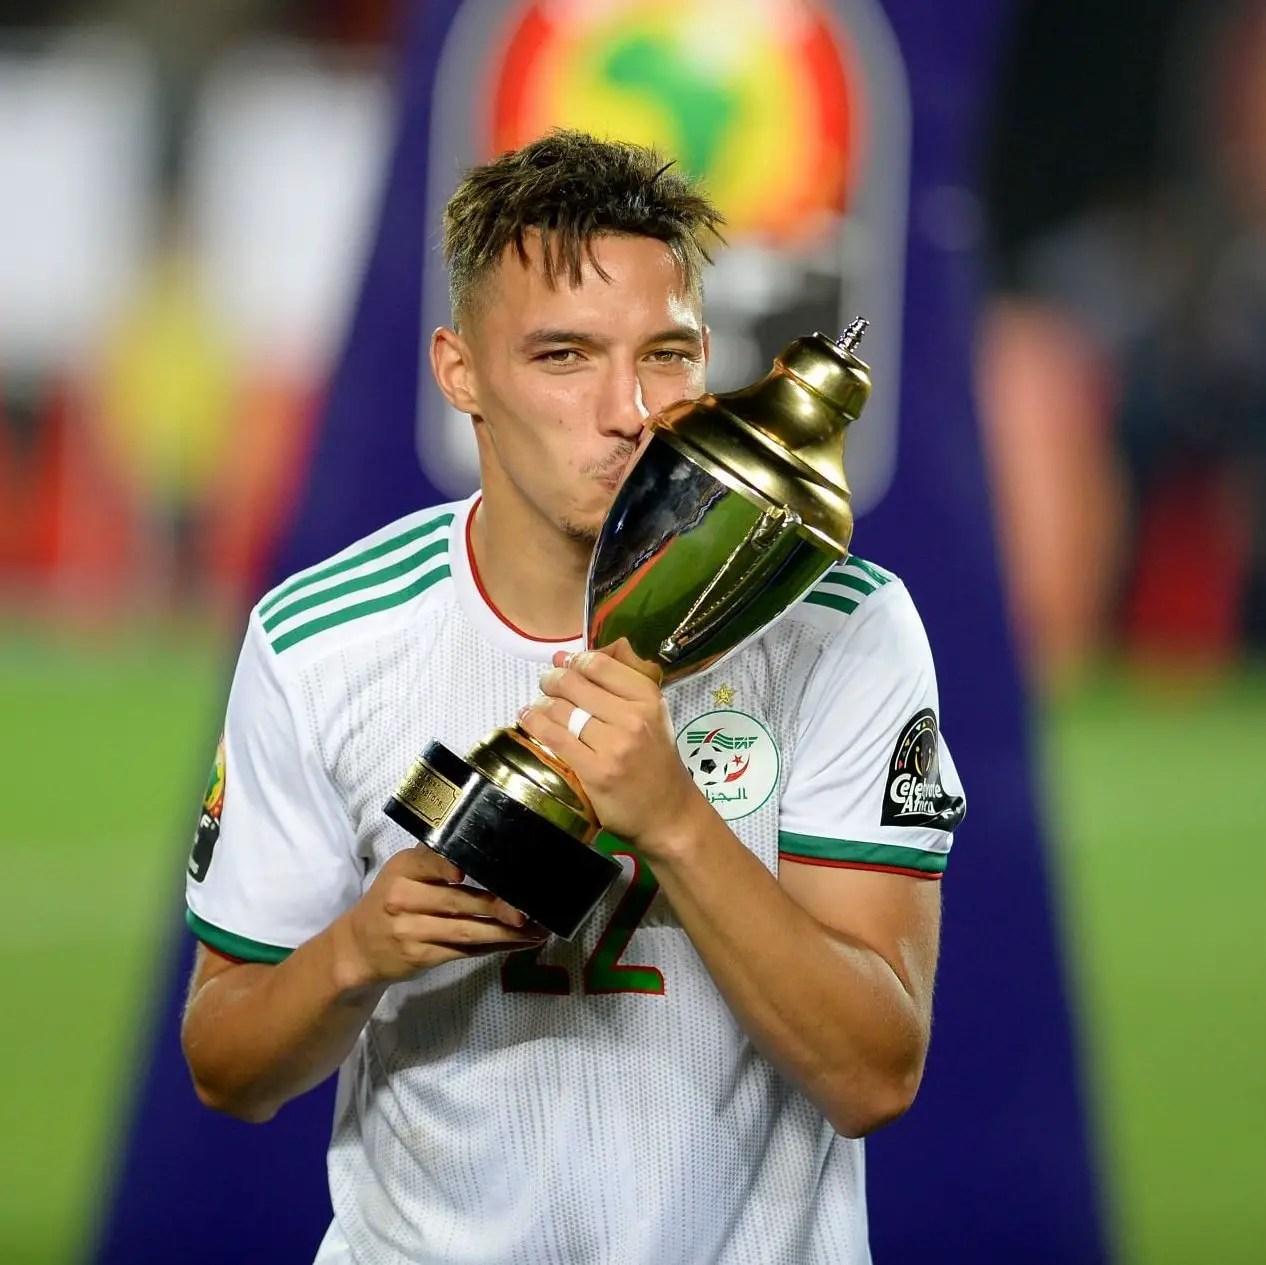 AFCON 2019: Algeria Midfielder Bennacer Wins MVP Award